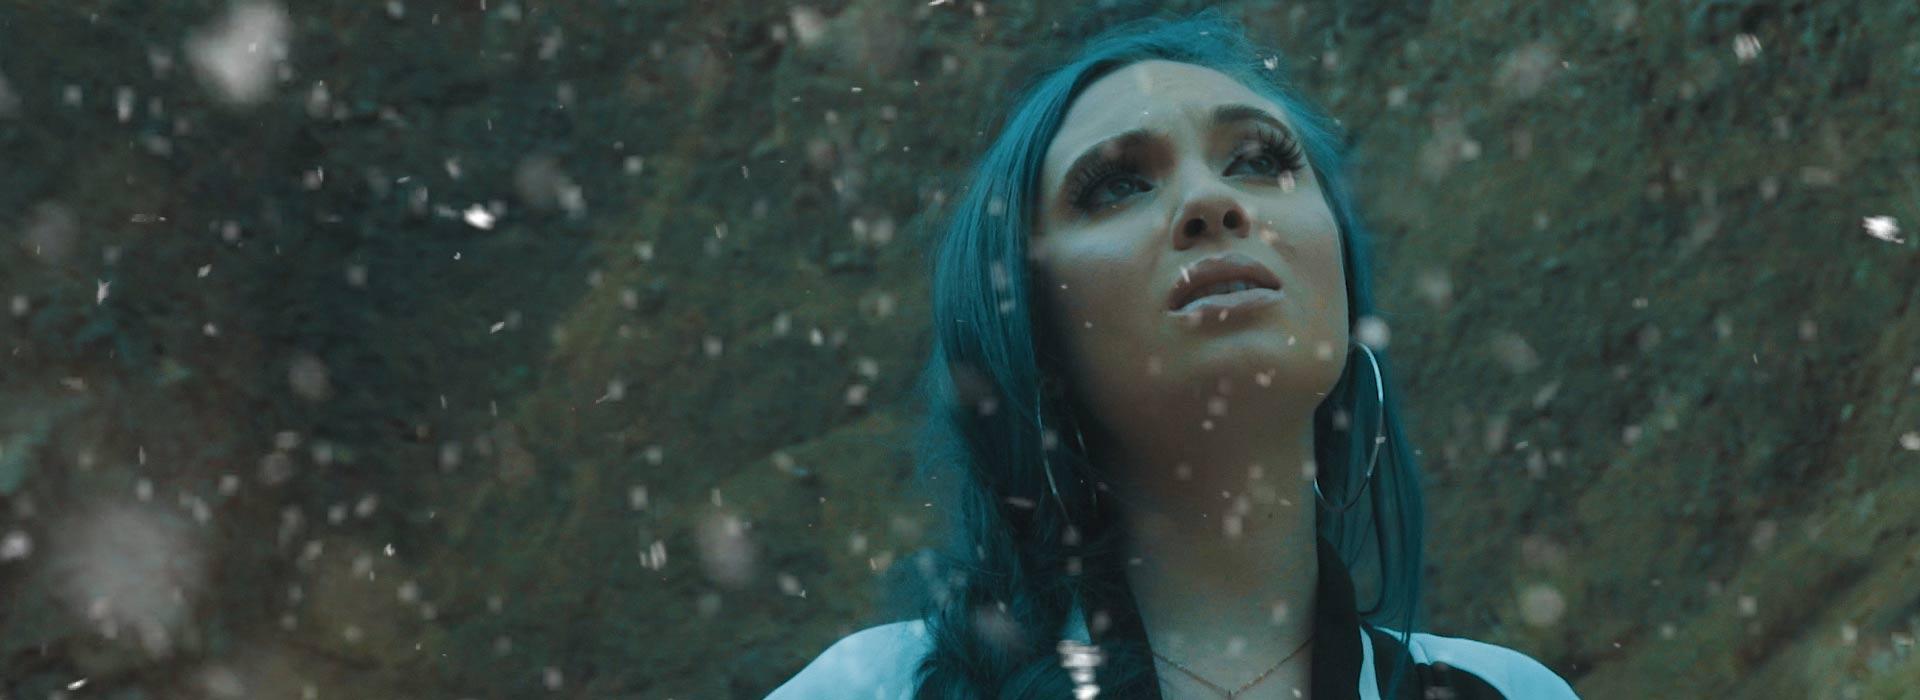 Black Summer - Sadness (ft Chloe Campbell)